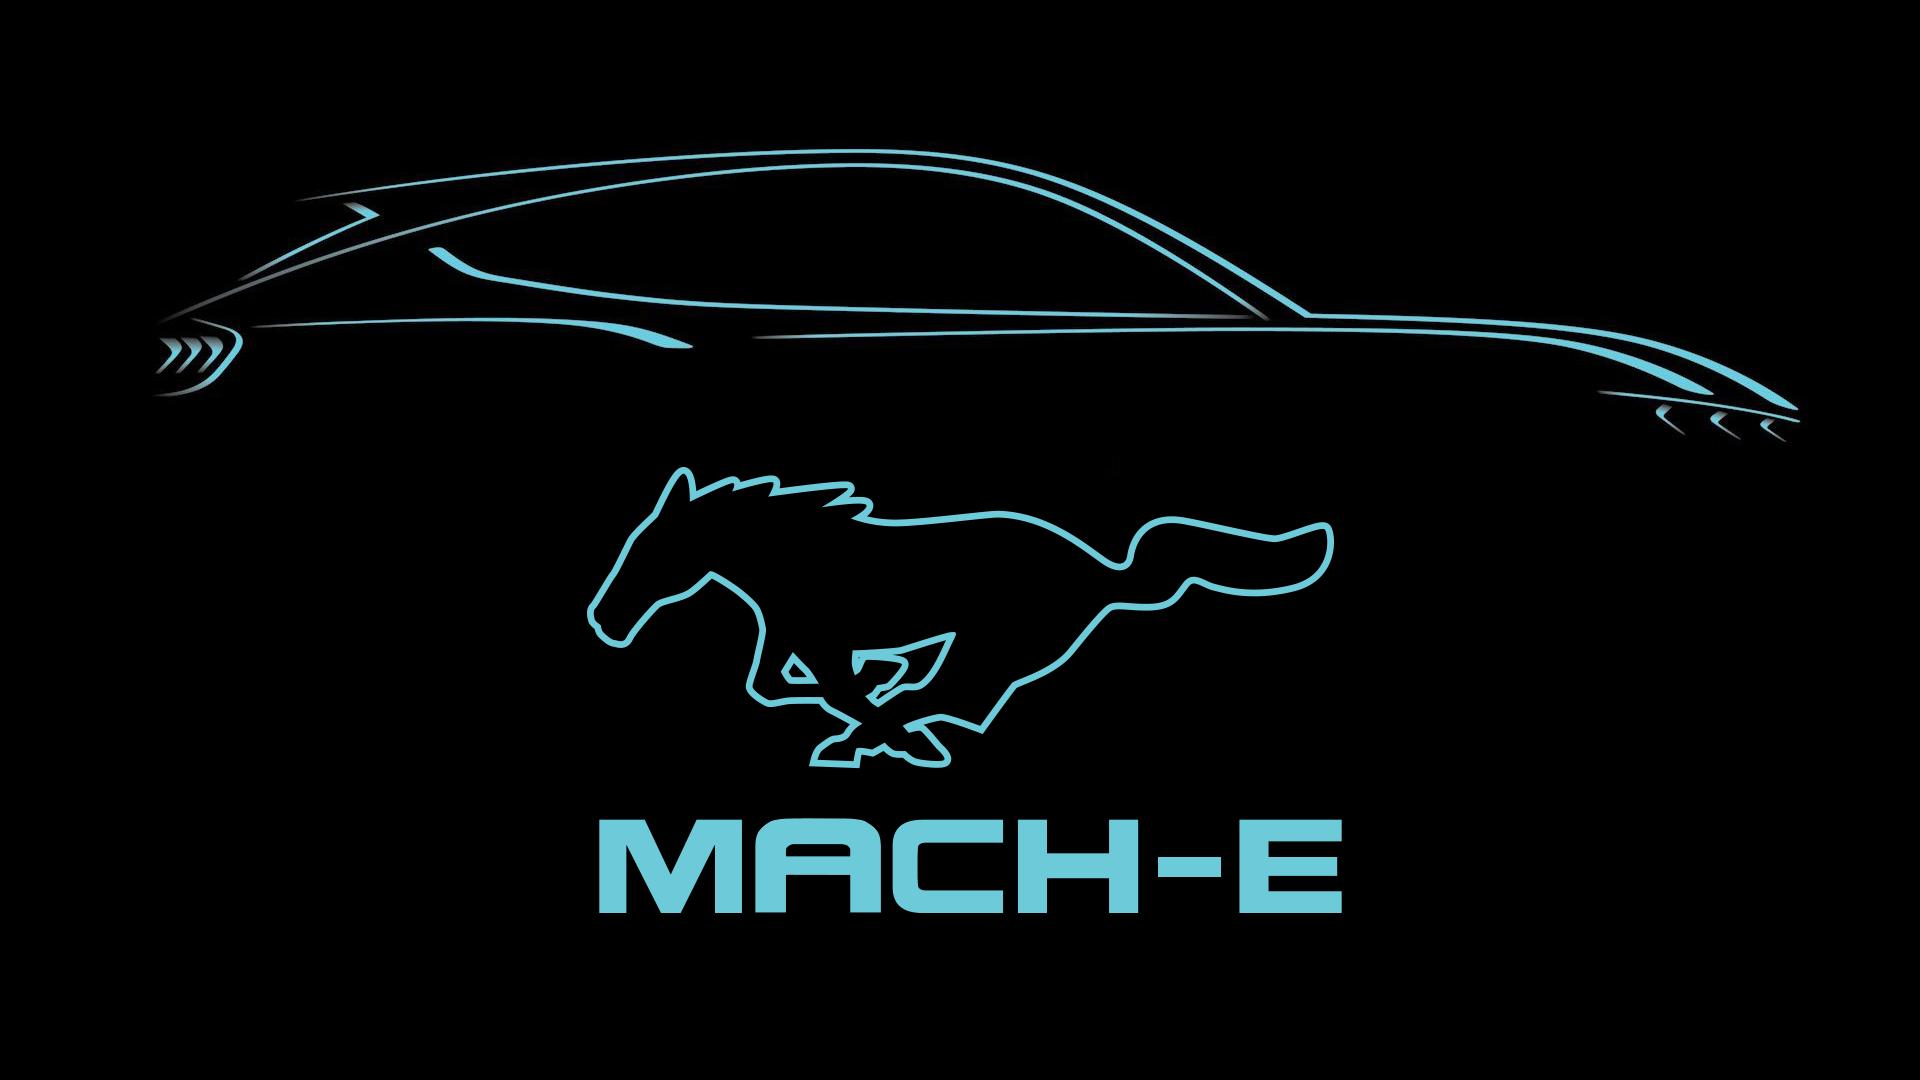 Mustang Mach-E Logo